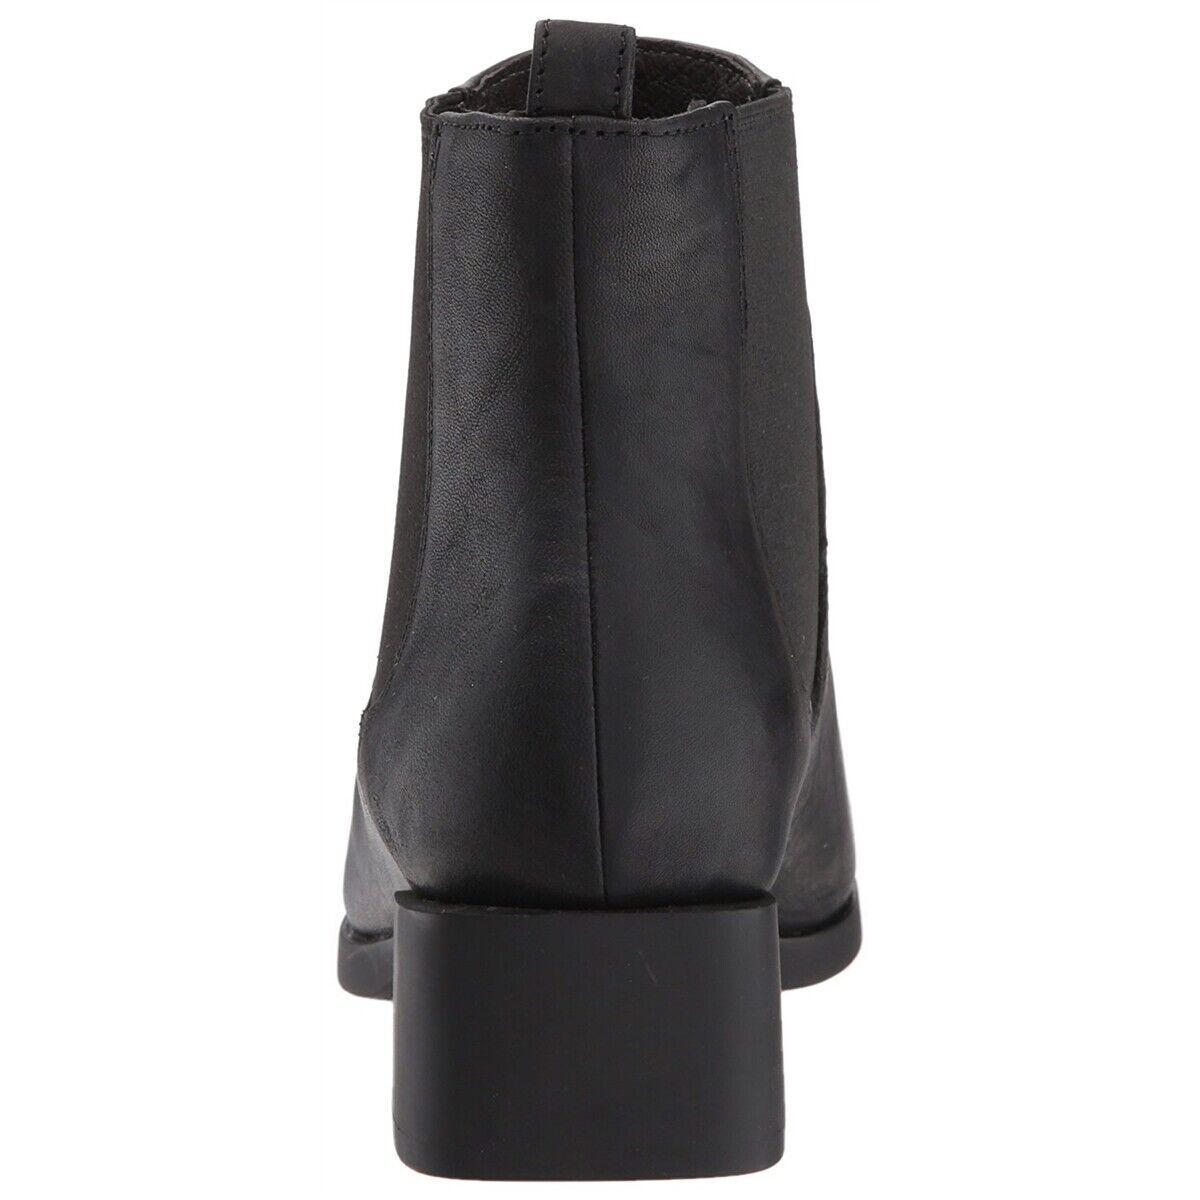 Camper Women NEW Kobo Chelsea Bootie Black Black Black Leather Slip On Comfort Boots 2f74cc